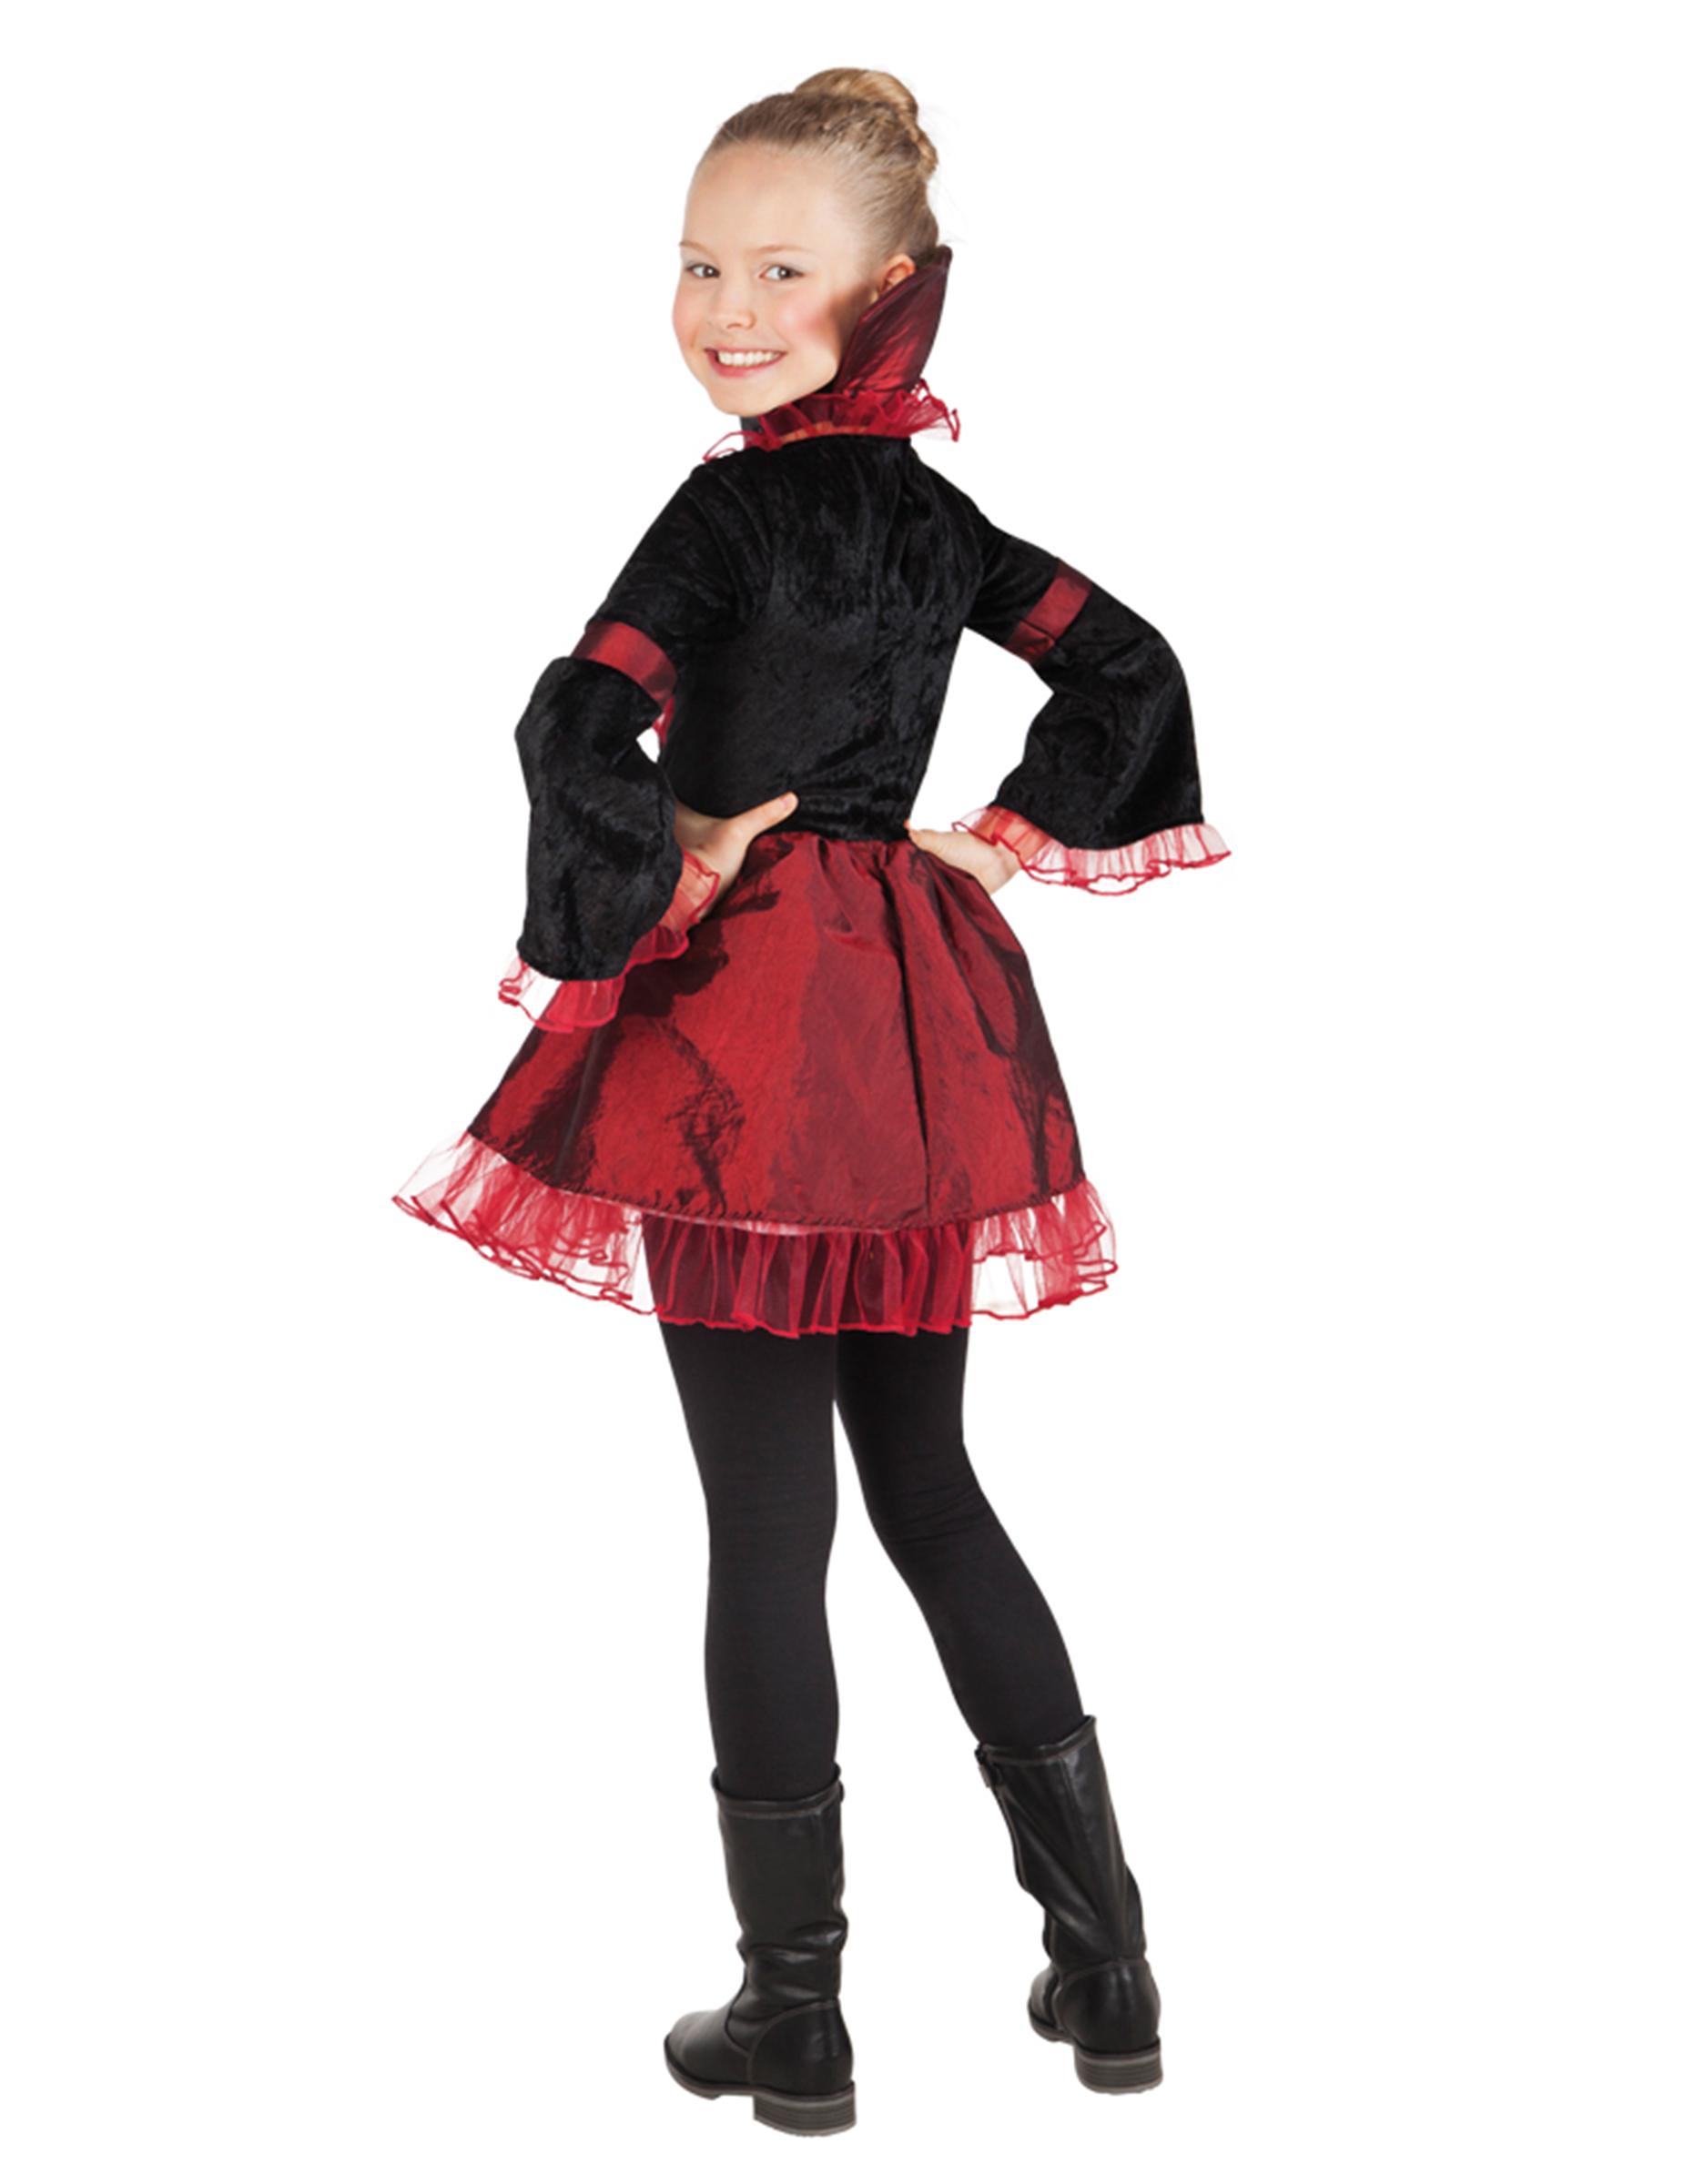 Costume imperatrice vampira bambina Halloween  Costumi bambini a4a24847daf1